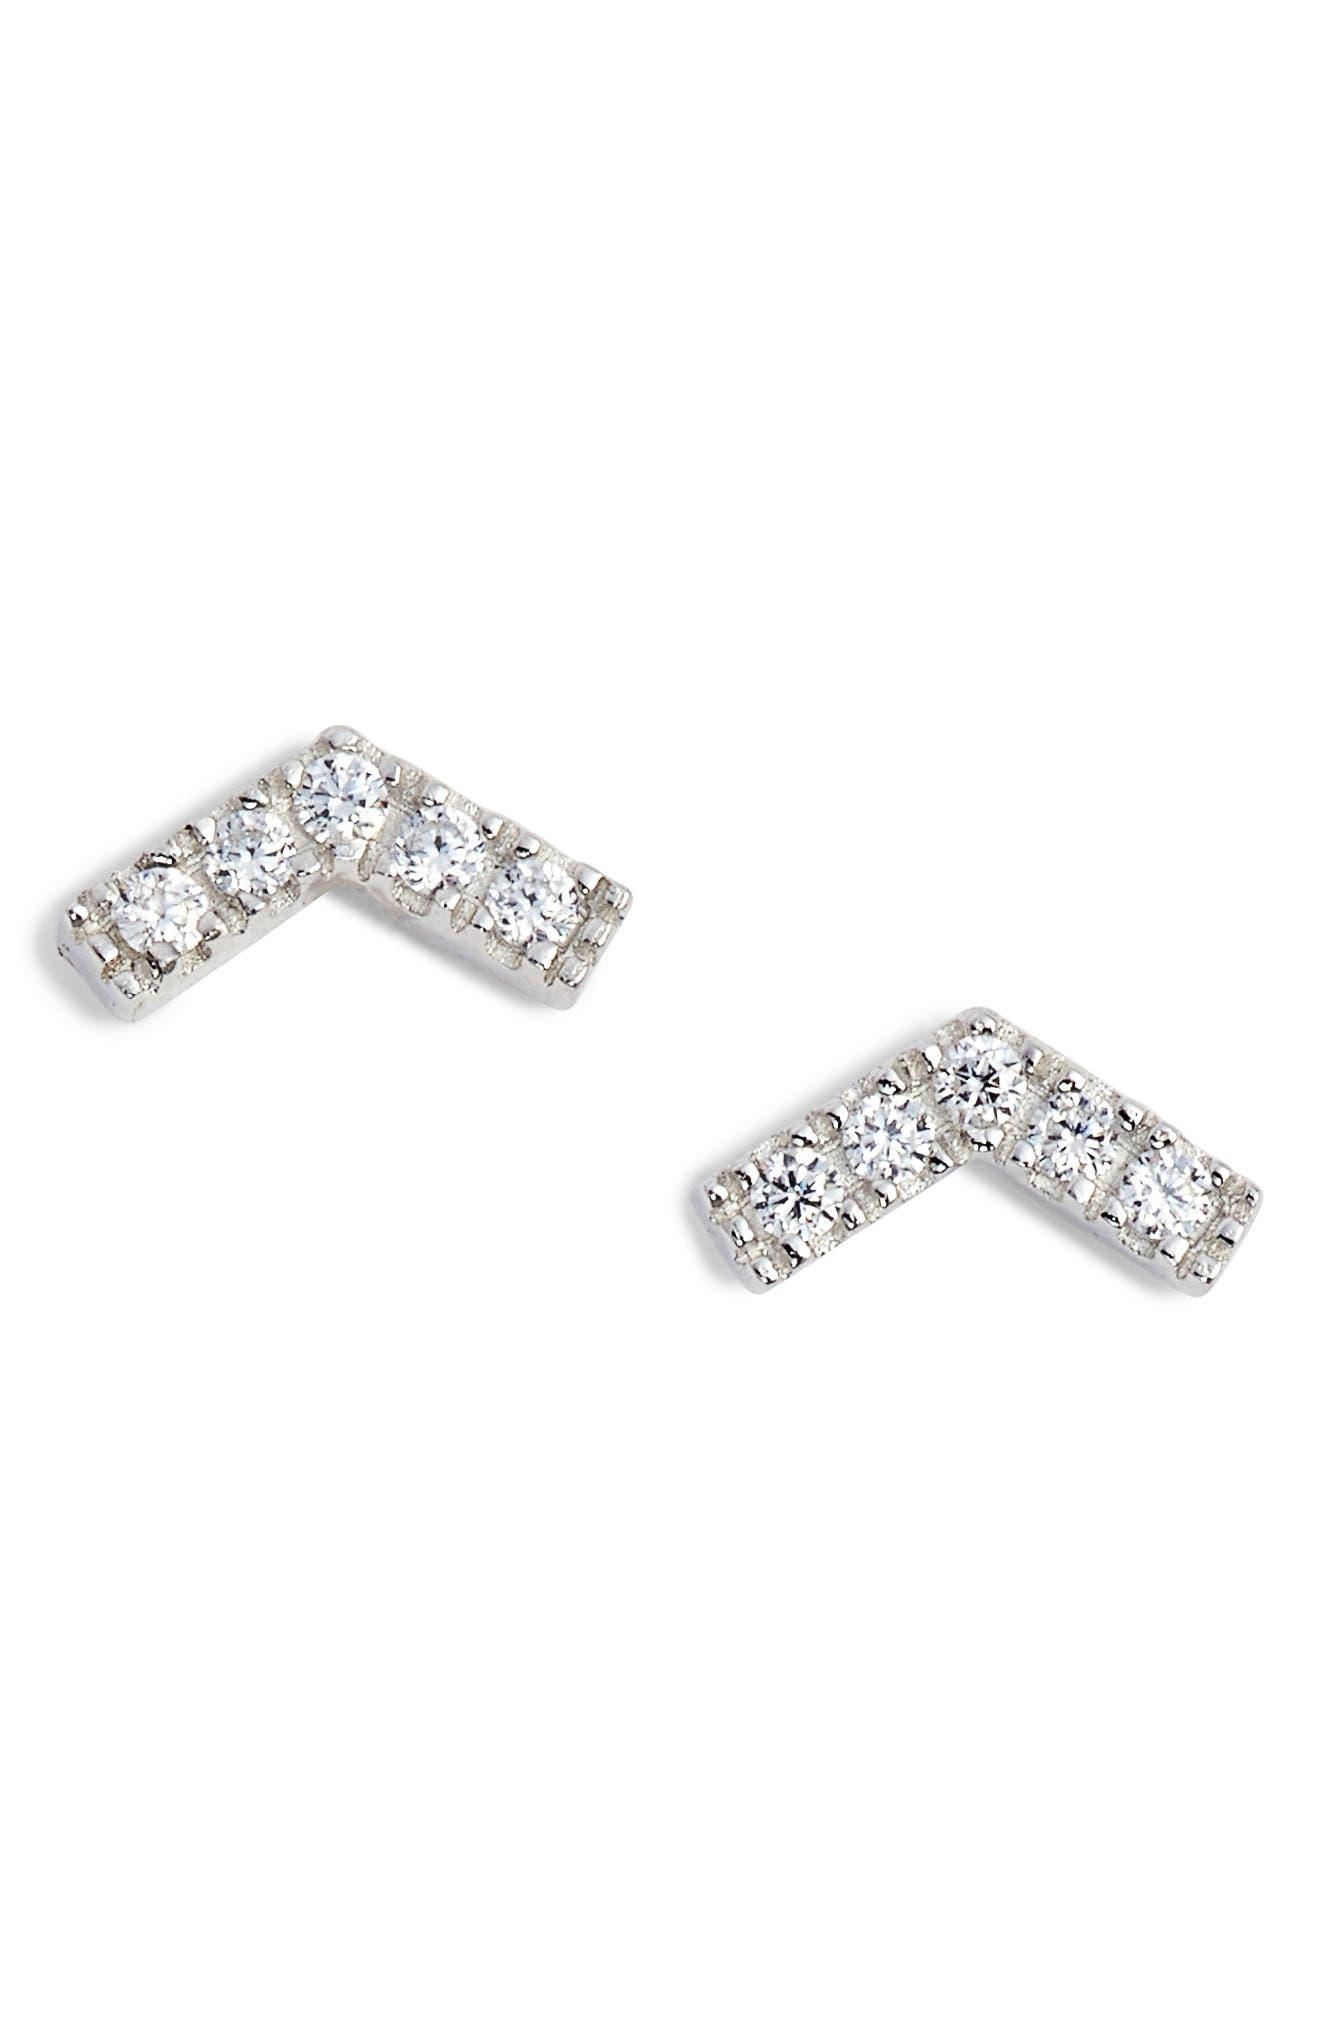 Chevron Stud Earrings,                             Main thumbnail 1, color,                             Platinum